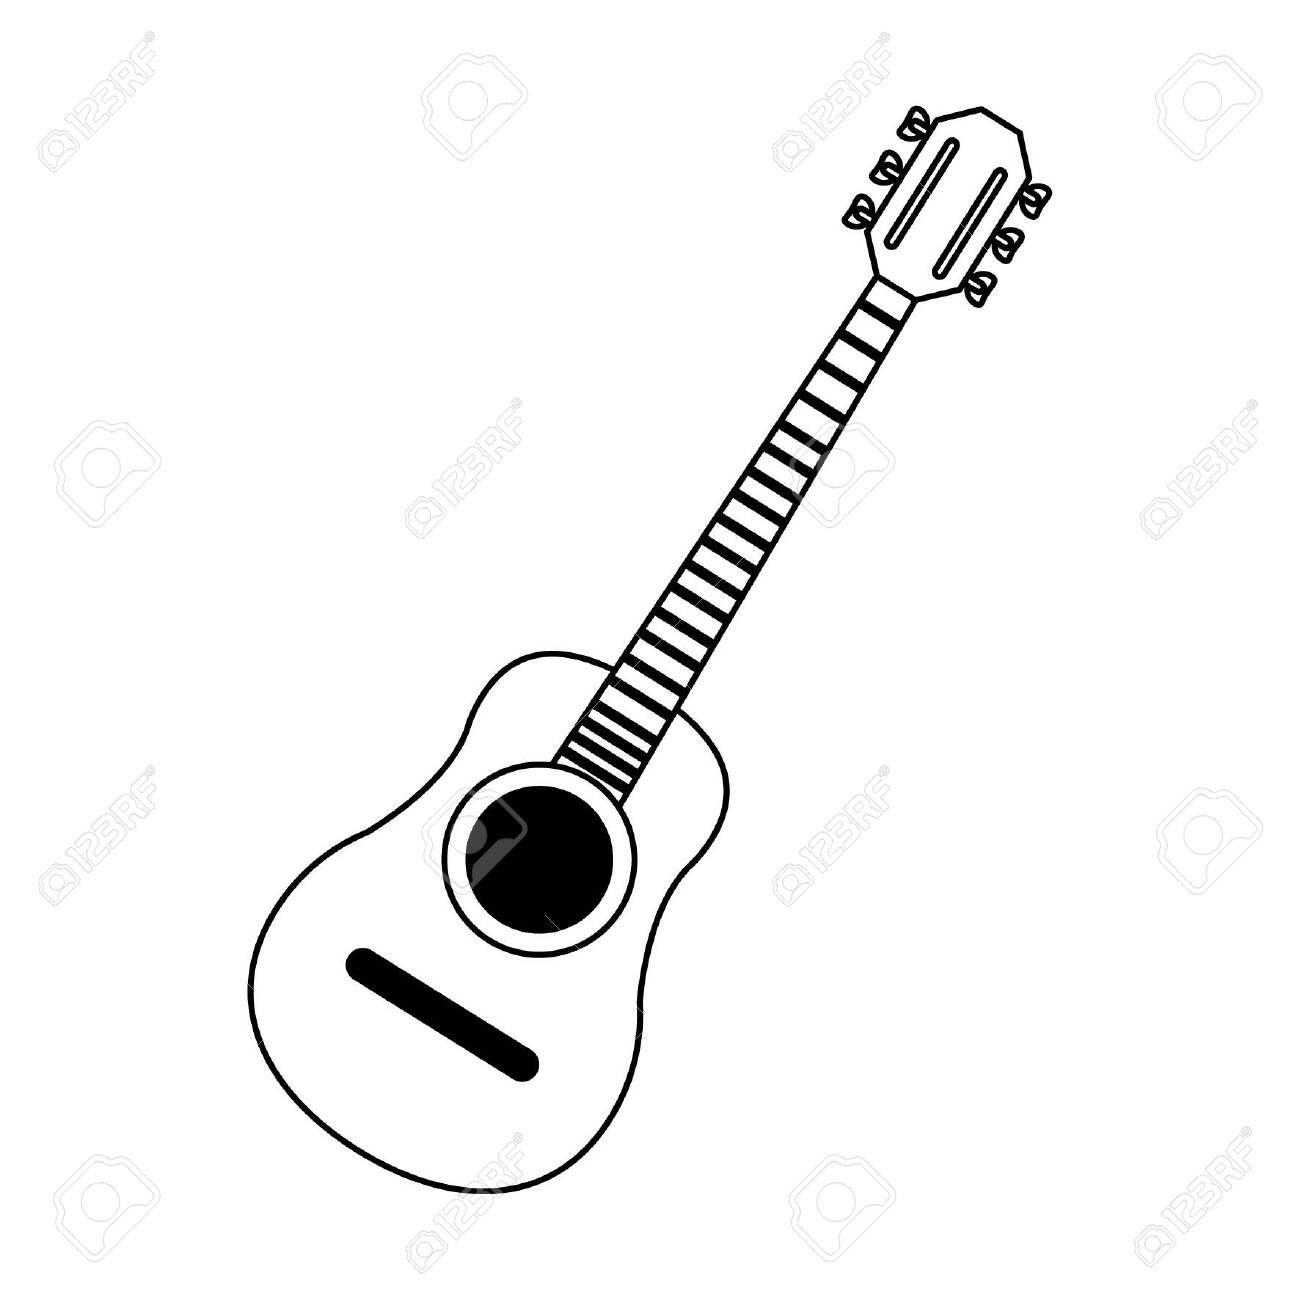 Acoustic Guitar Music Instrument Vector Illustration Graphic Design Sponsored Music Acoustic Guitar Music Social Media Design Graphics Music Instruments